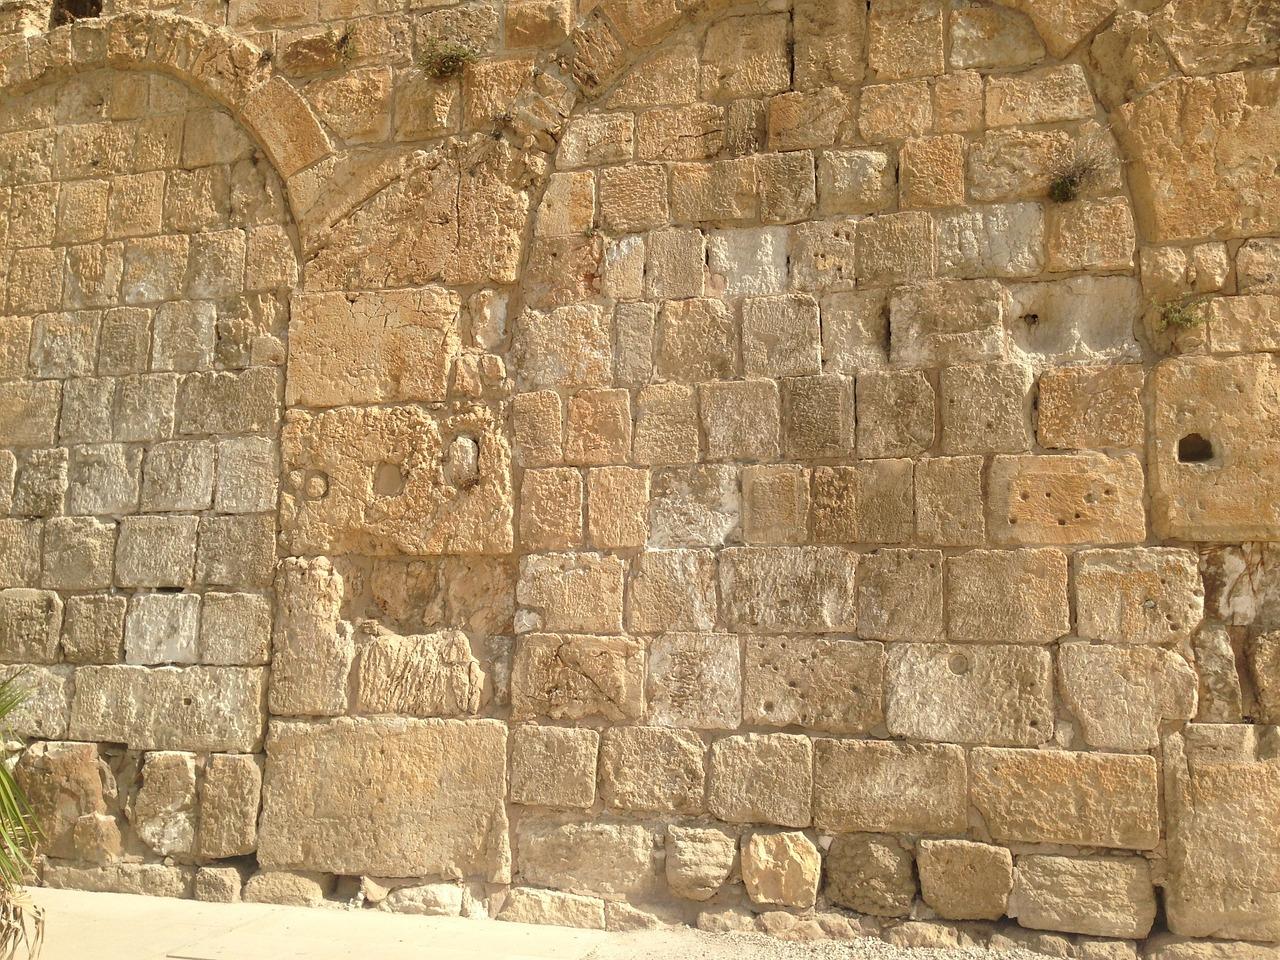 Jerusalem Stone, Hulda Gates arches filled in